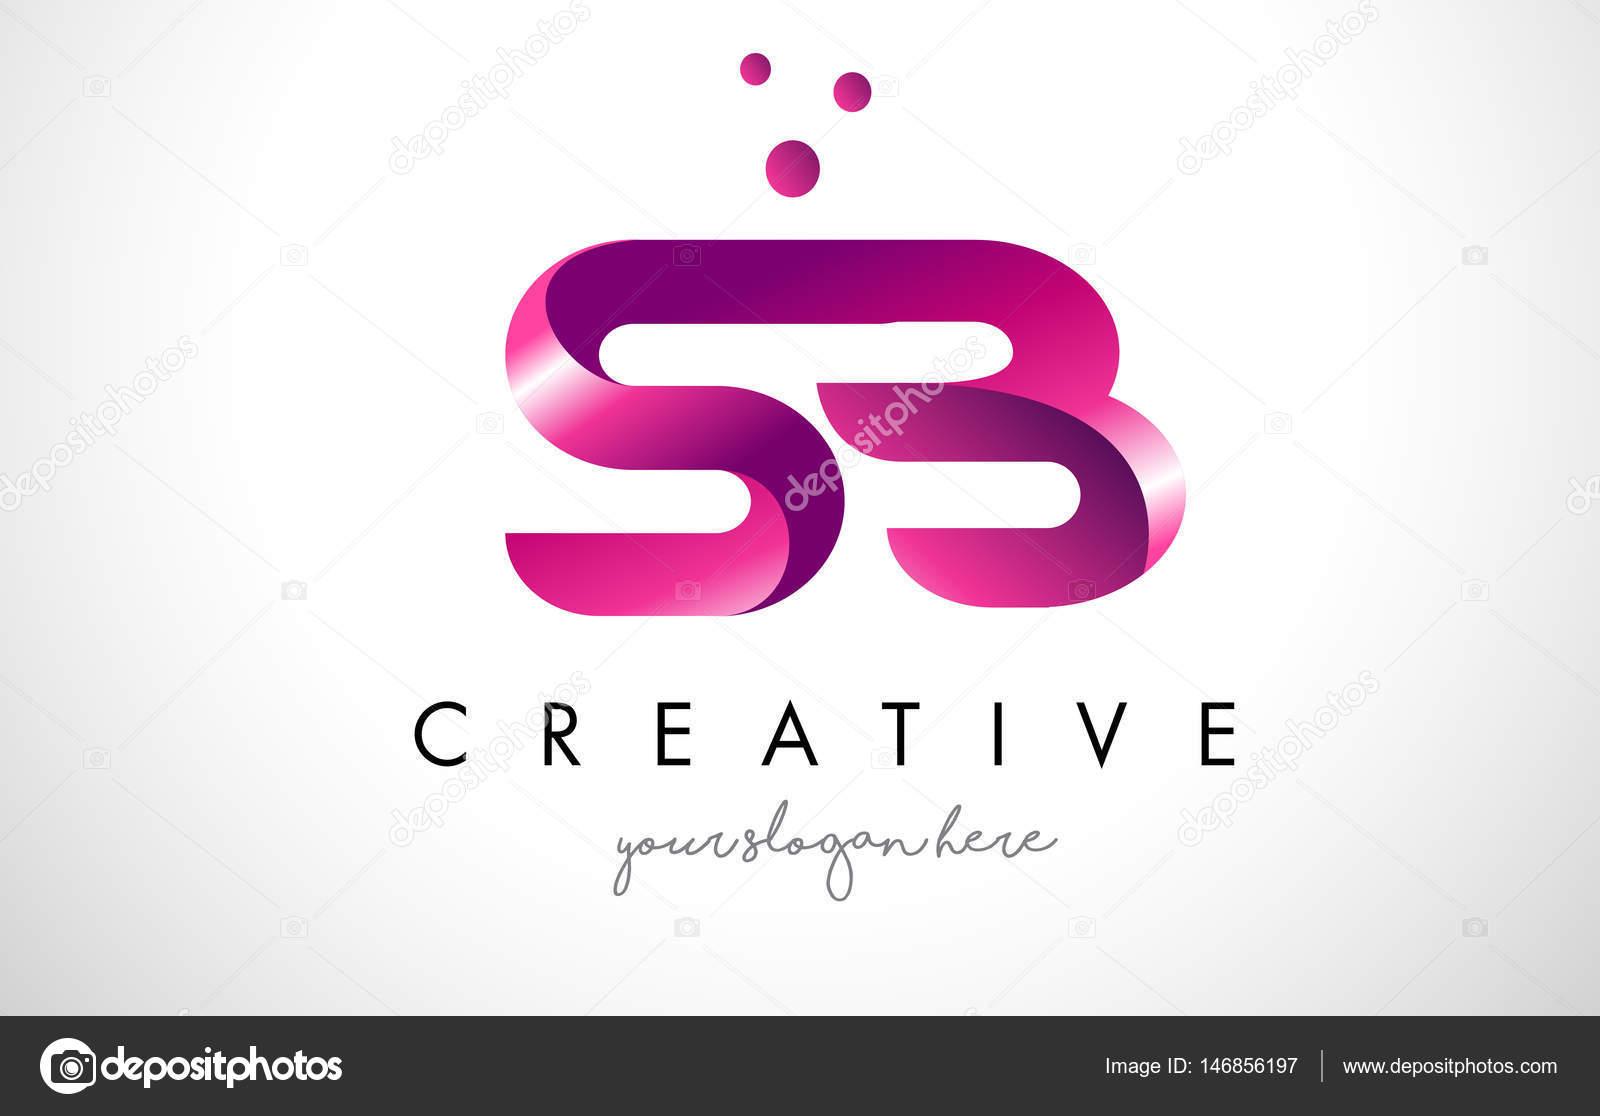 Sb Stock Vectors, Royalty Free Sb Illustrations | Depositphotos®